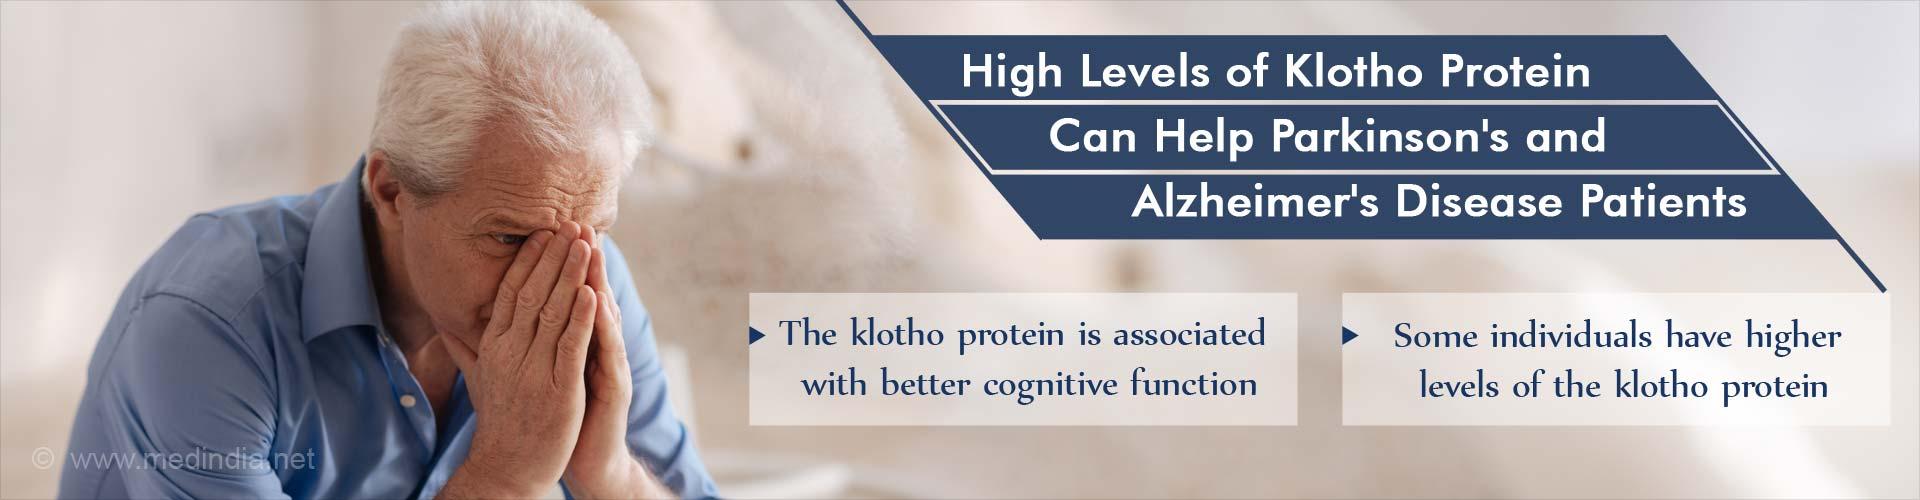 Klotho Protein Fragment (αKL-F) Could Improve Cognition